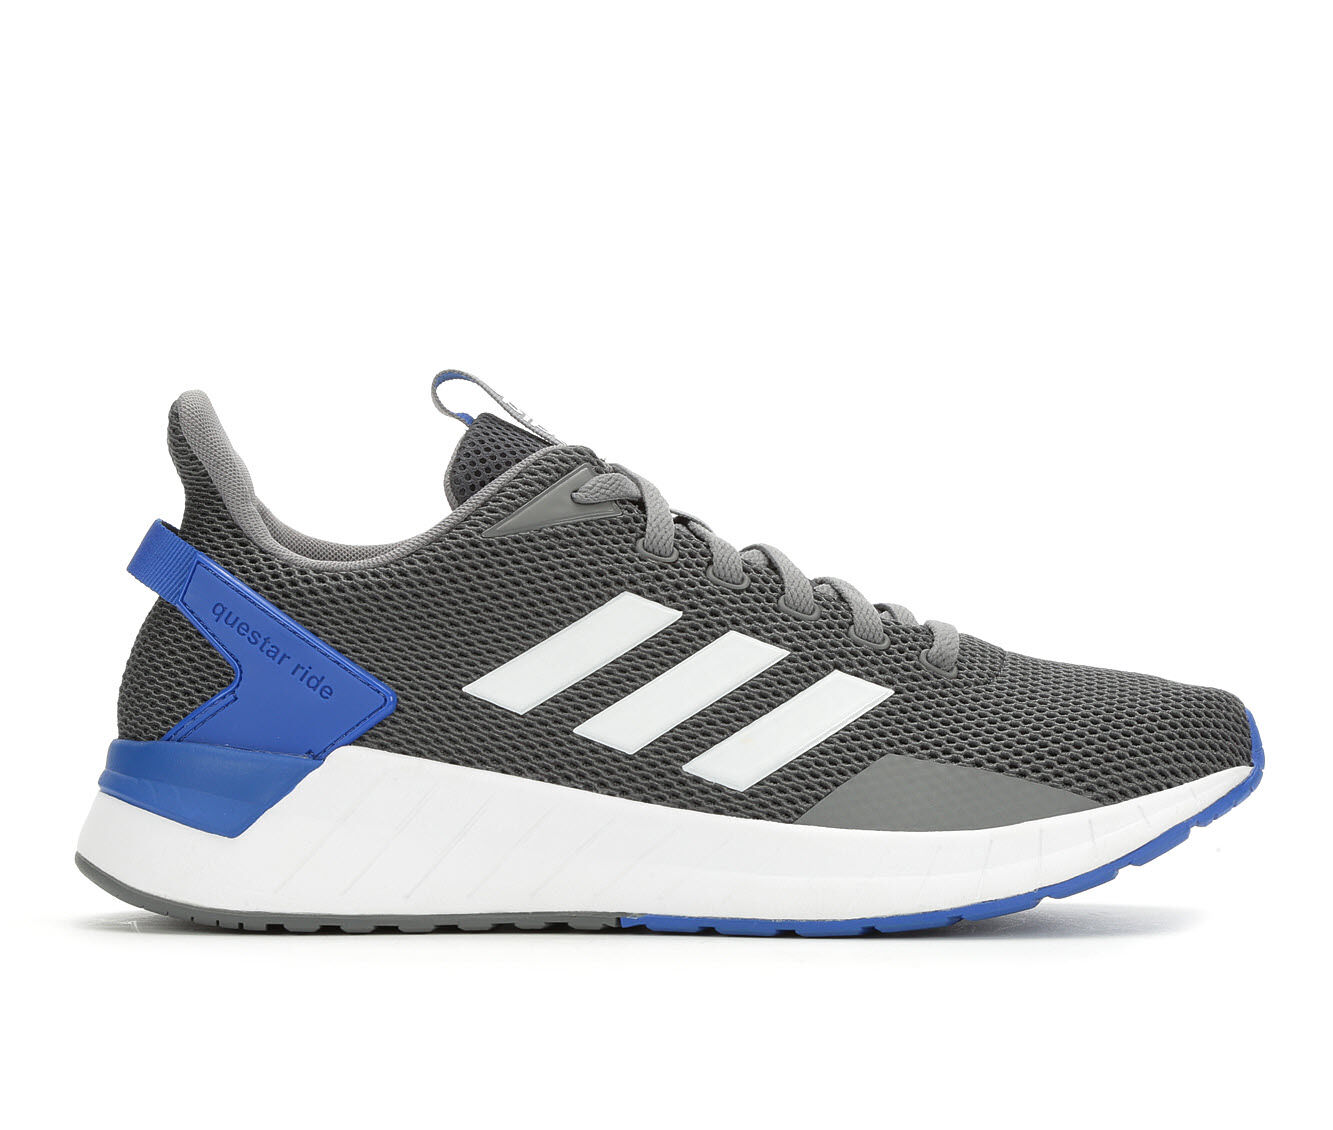 pretty nice 7e18e 917bb greece adidas questar ride running shoes. carousel controls fb192 5879f